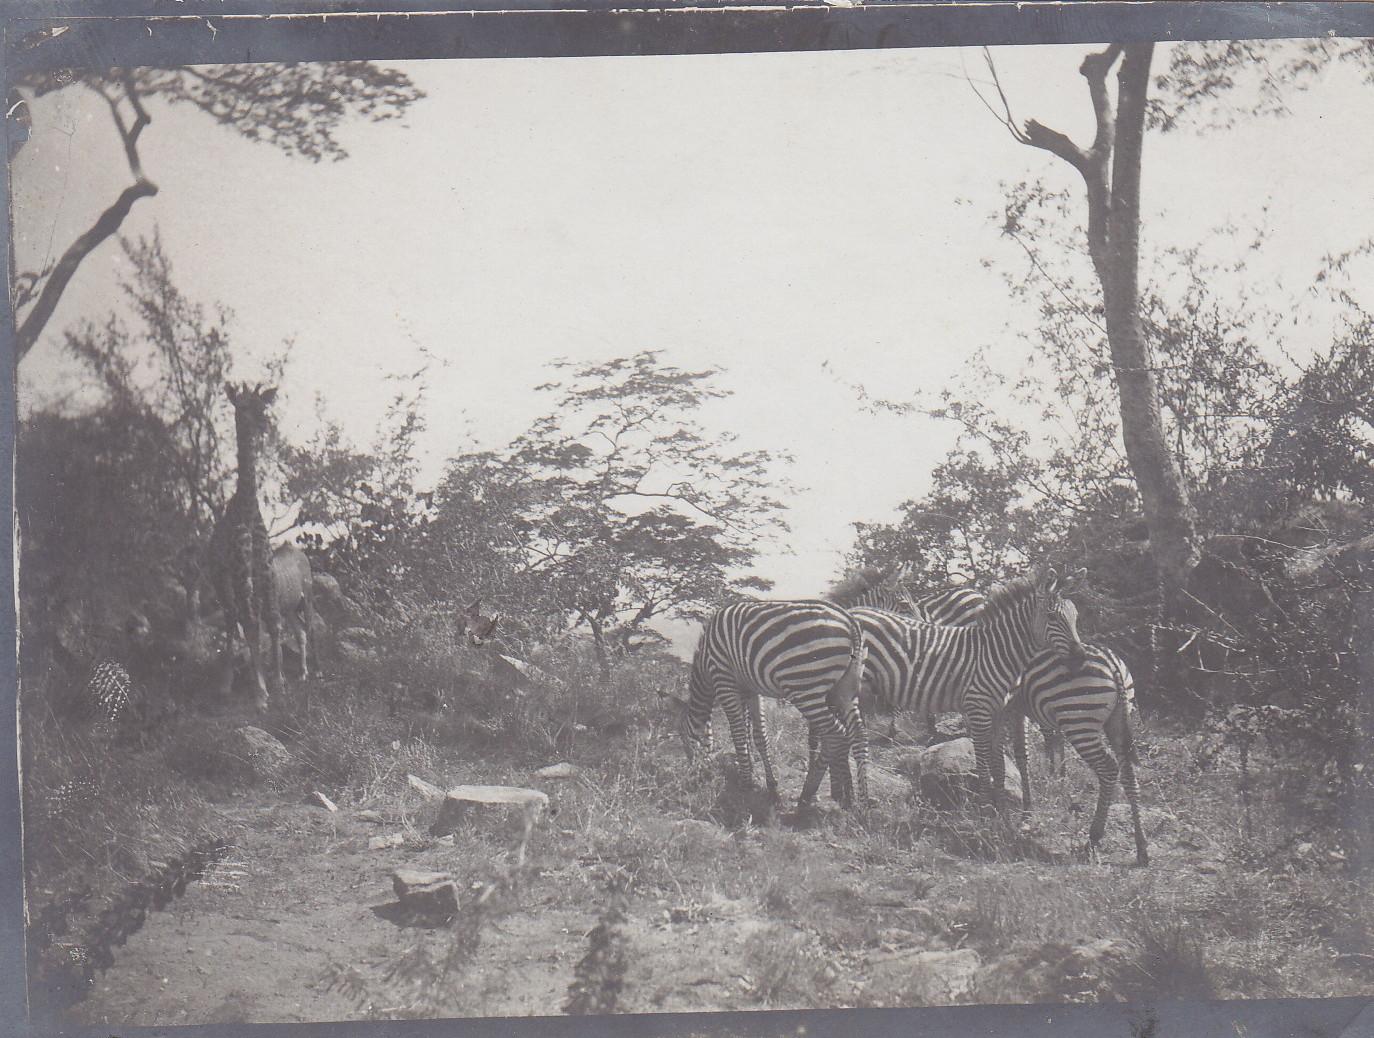 Zebras und Giraffe am Tanganjika-See